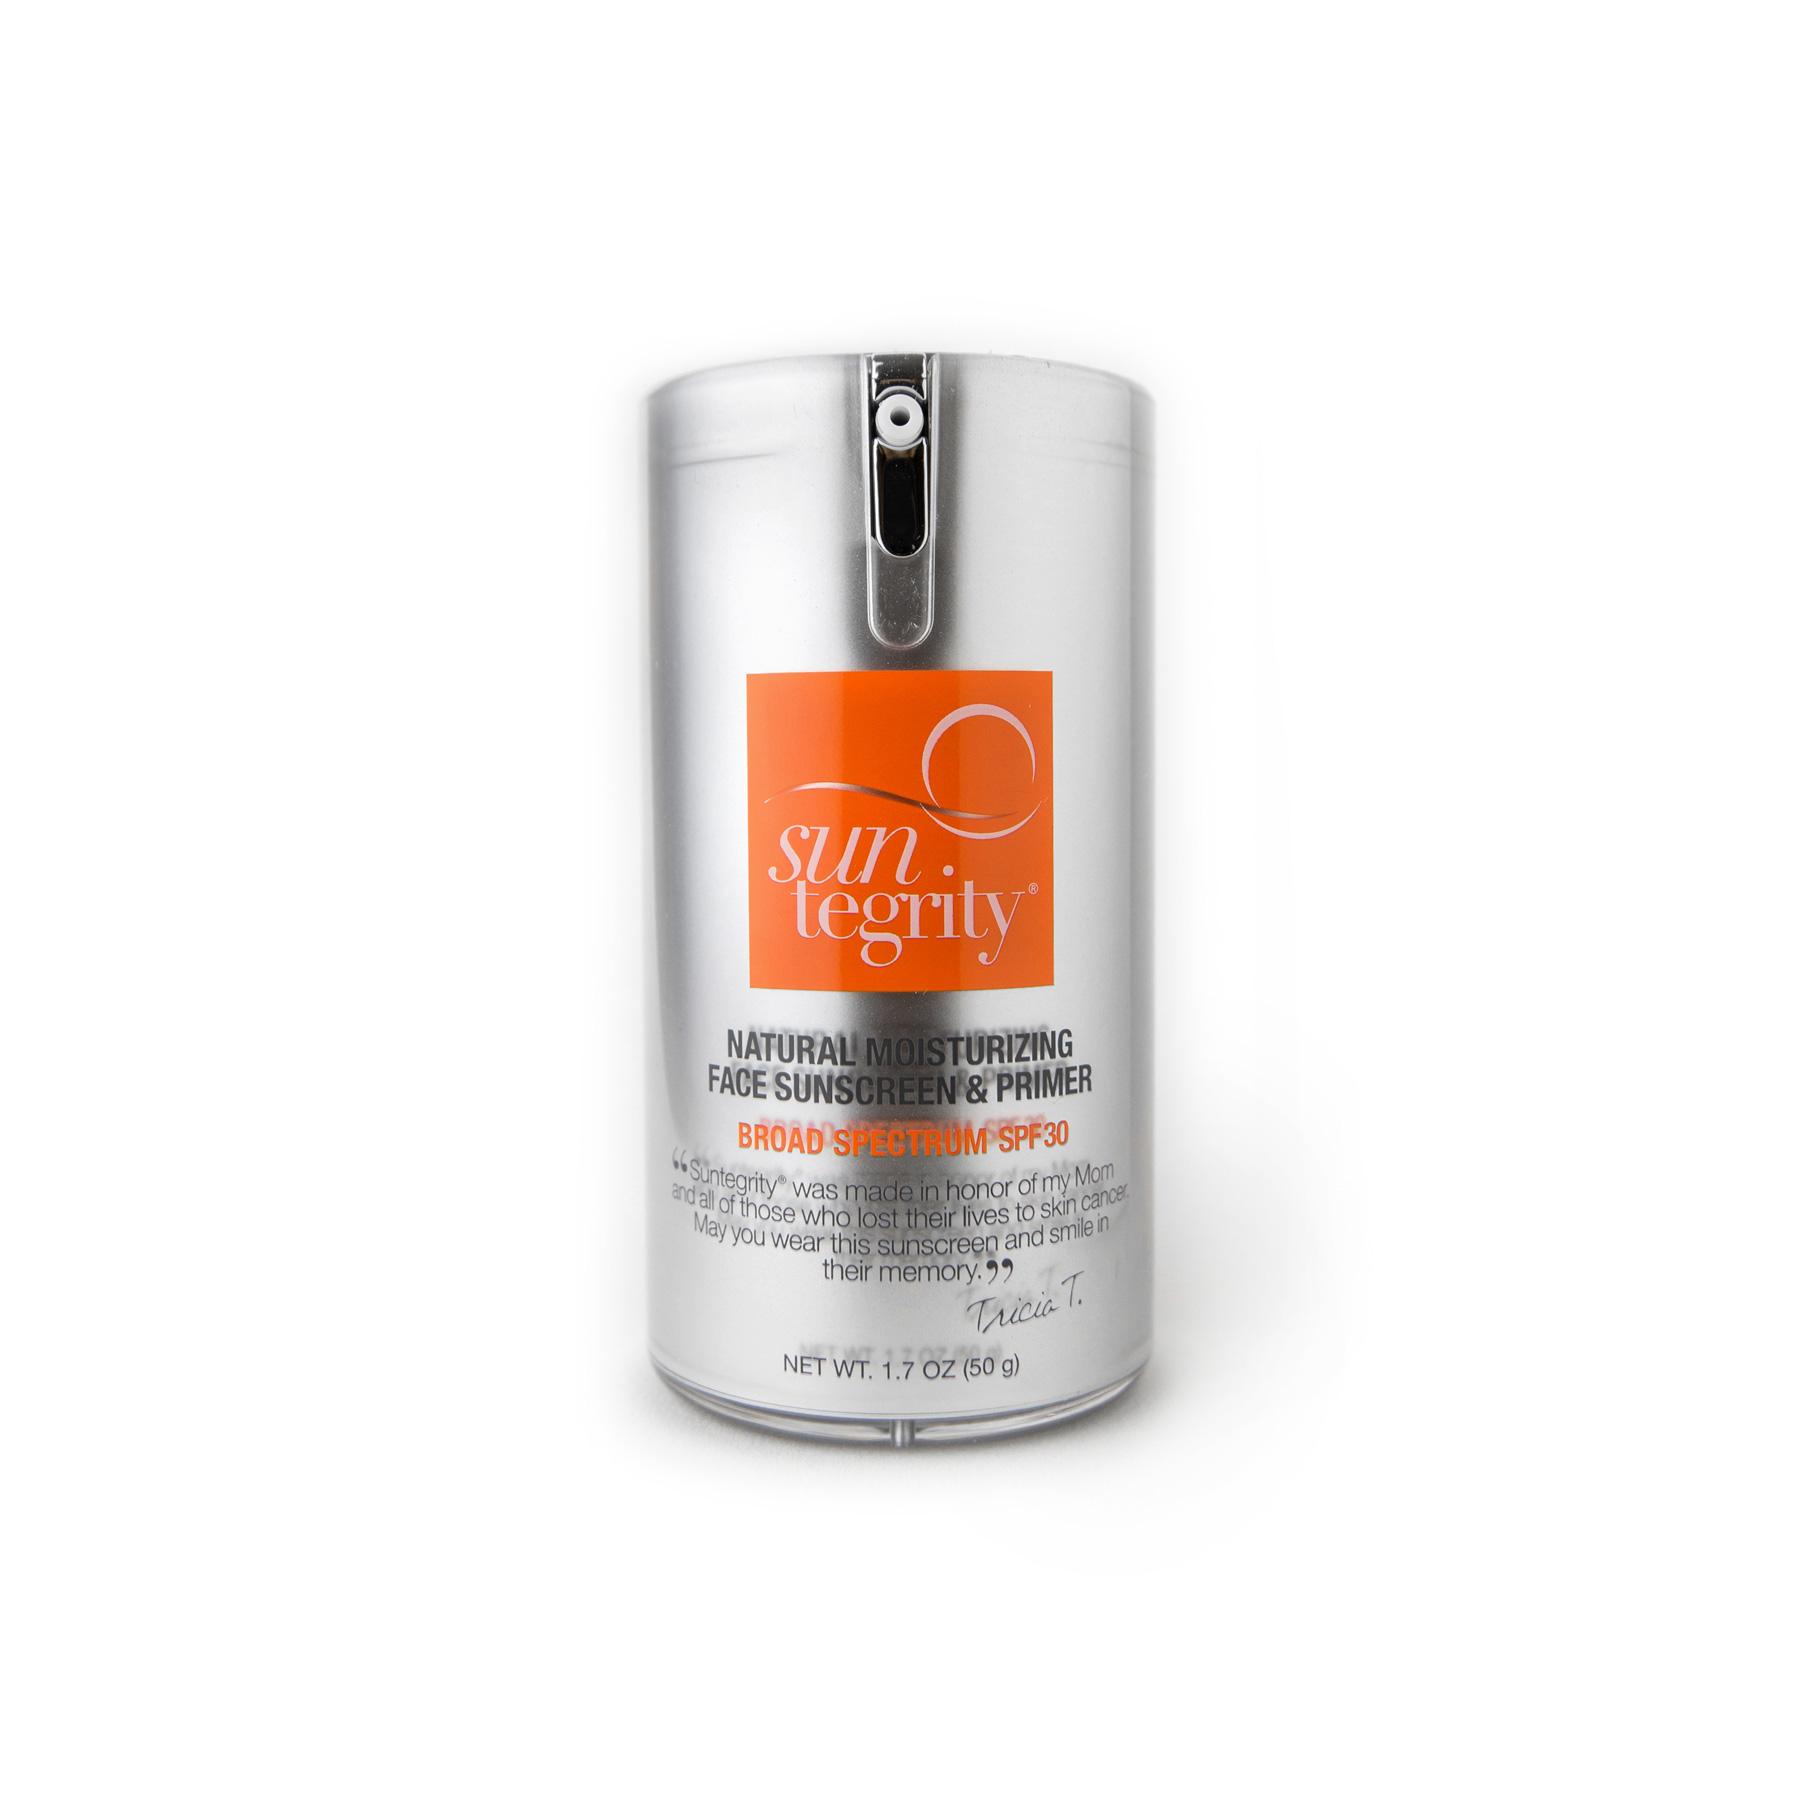 Moisturizing Face Sunscreen & Primer $45